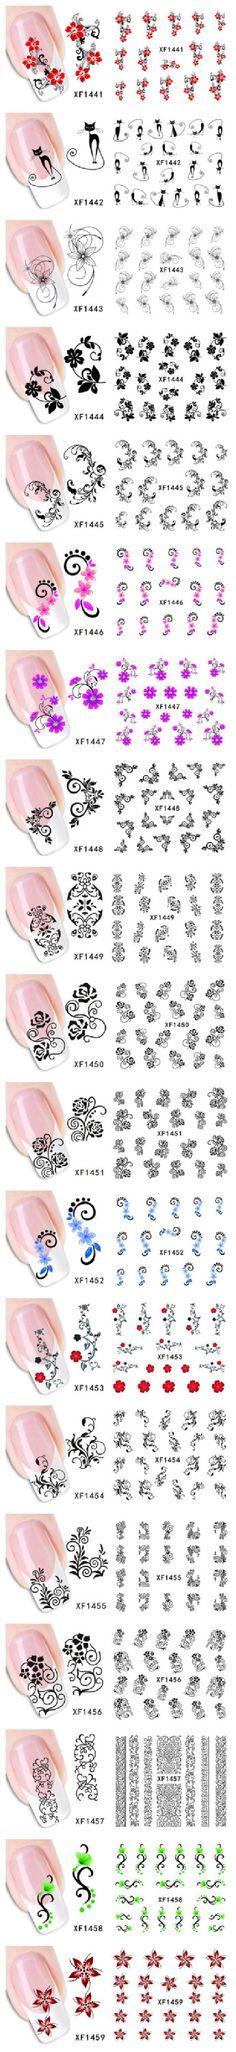 water transfer nail sticker wall sticker 3d Colored Nail Sticker,Handmade Nail Art,Water Nail Decal